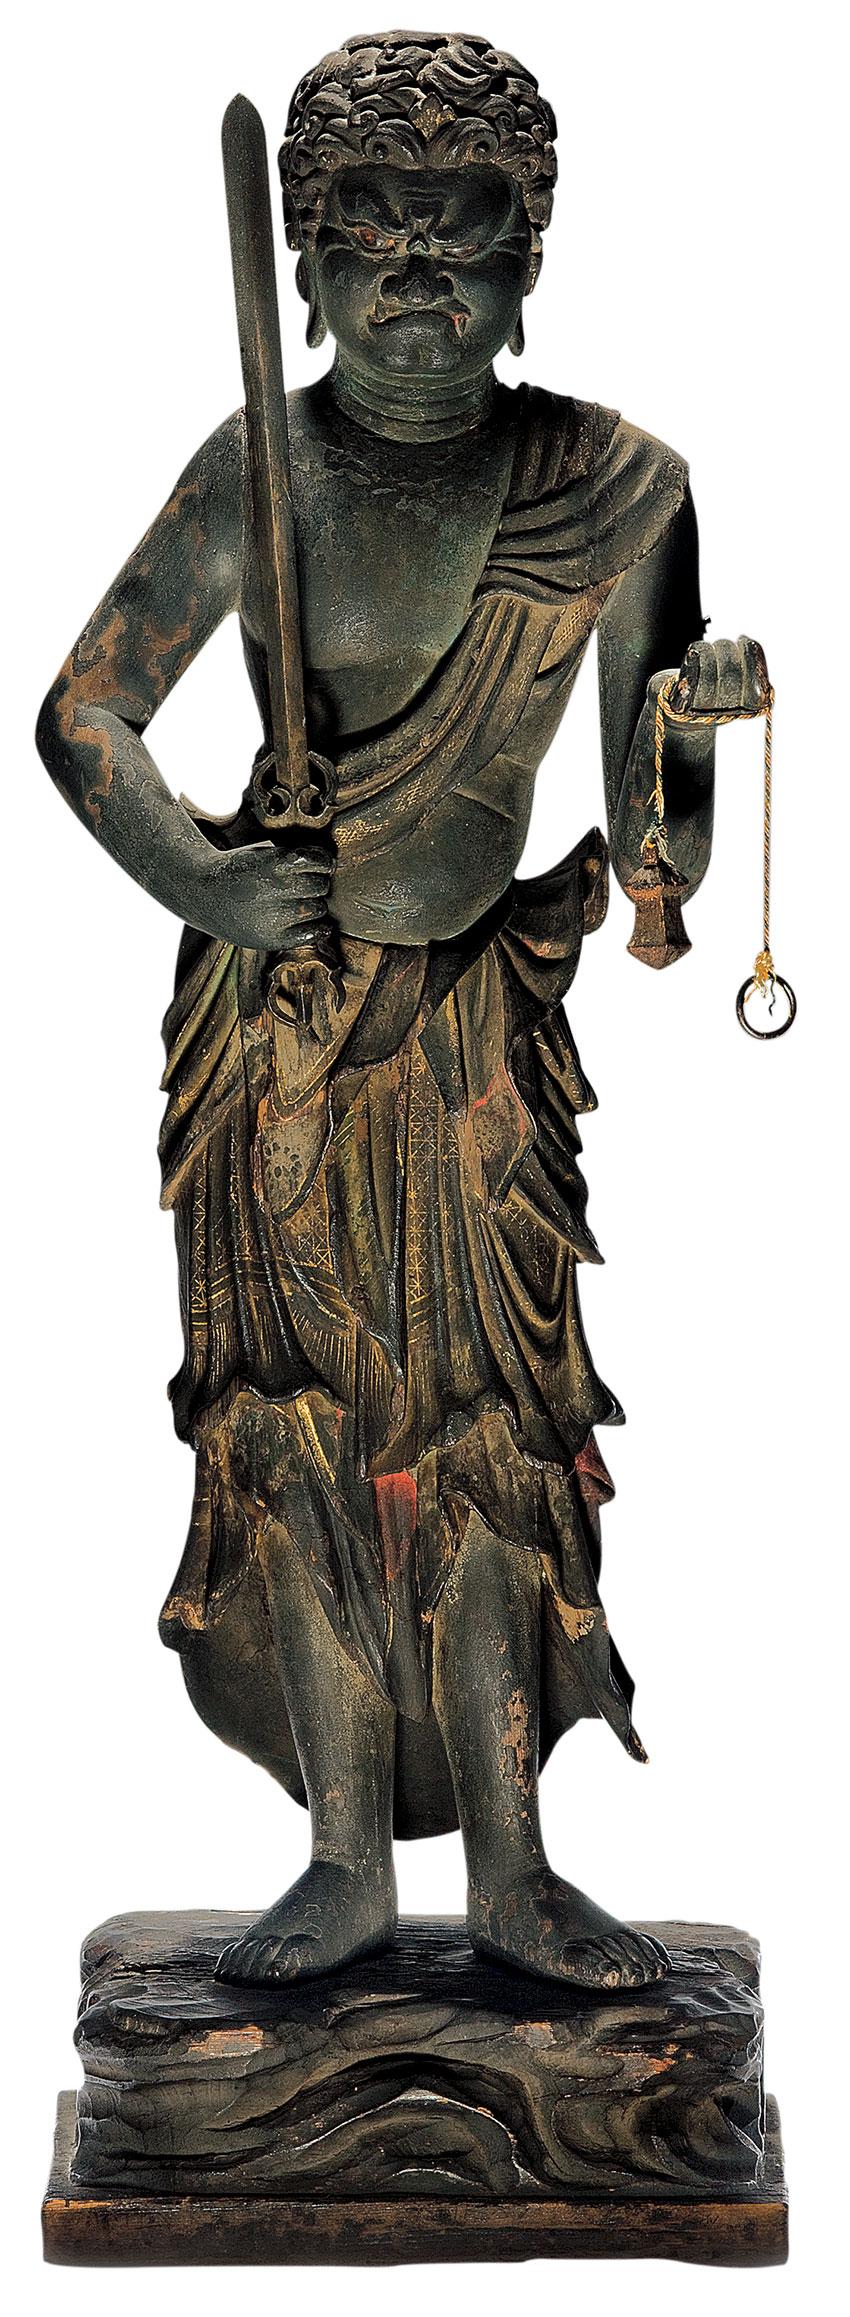 Japan, Fudõ Myõõ, 14th-15th century, Japan, wood, traces of colour and gilding, brass, cotton